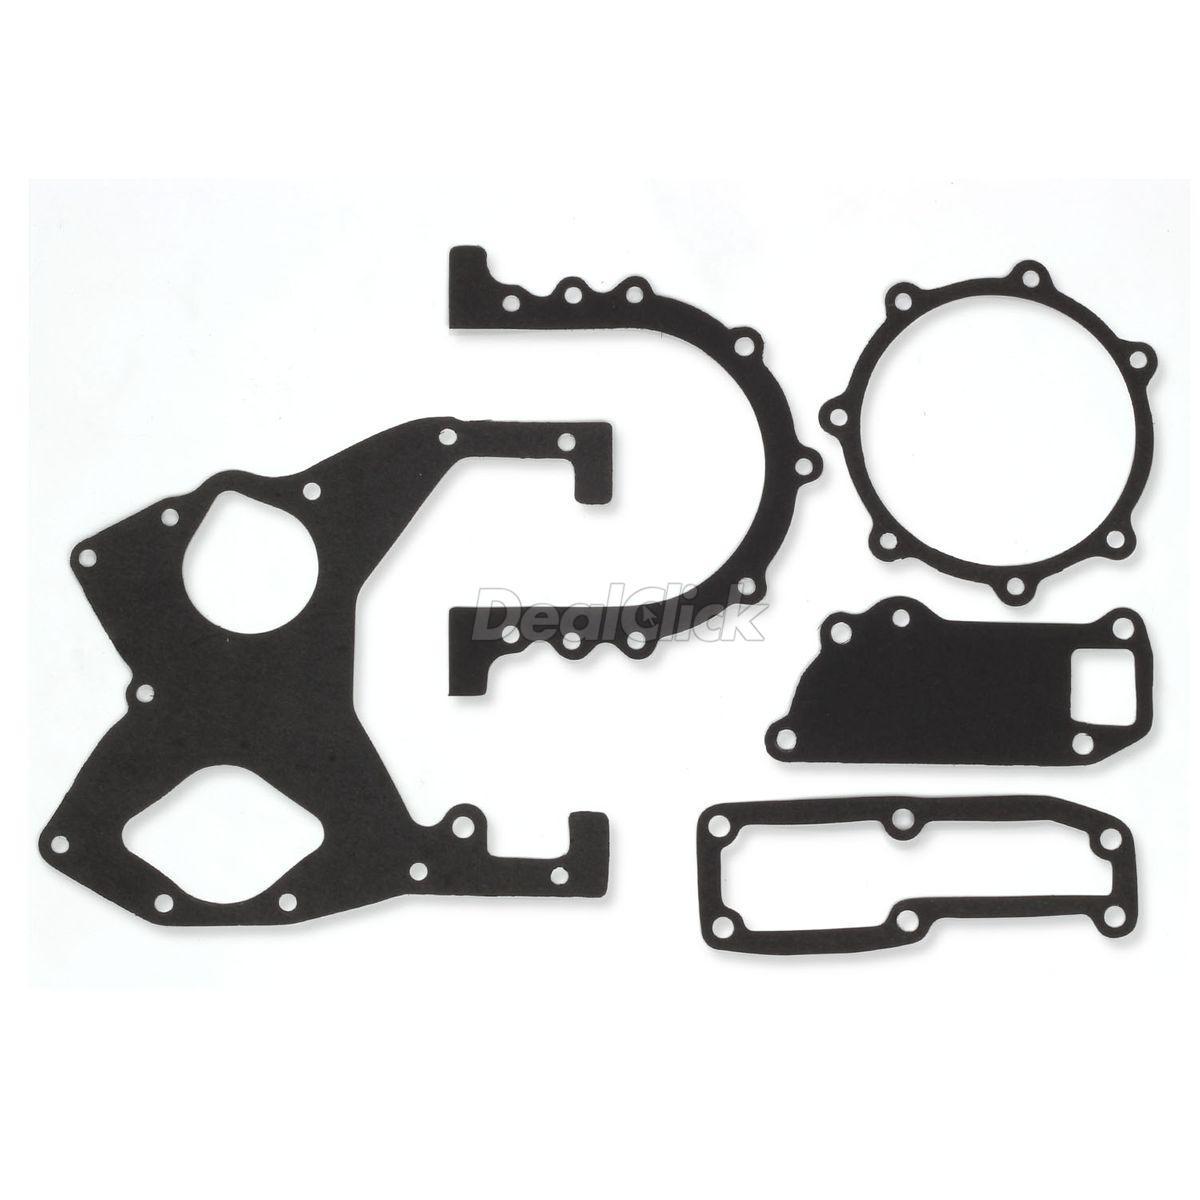 For 92-98 GMC ISUZU Chevrolet Head Gasket 3.9L 4BD2 Turbo